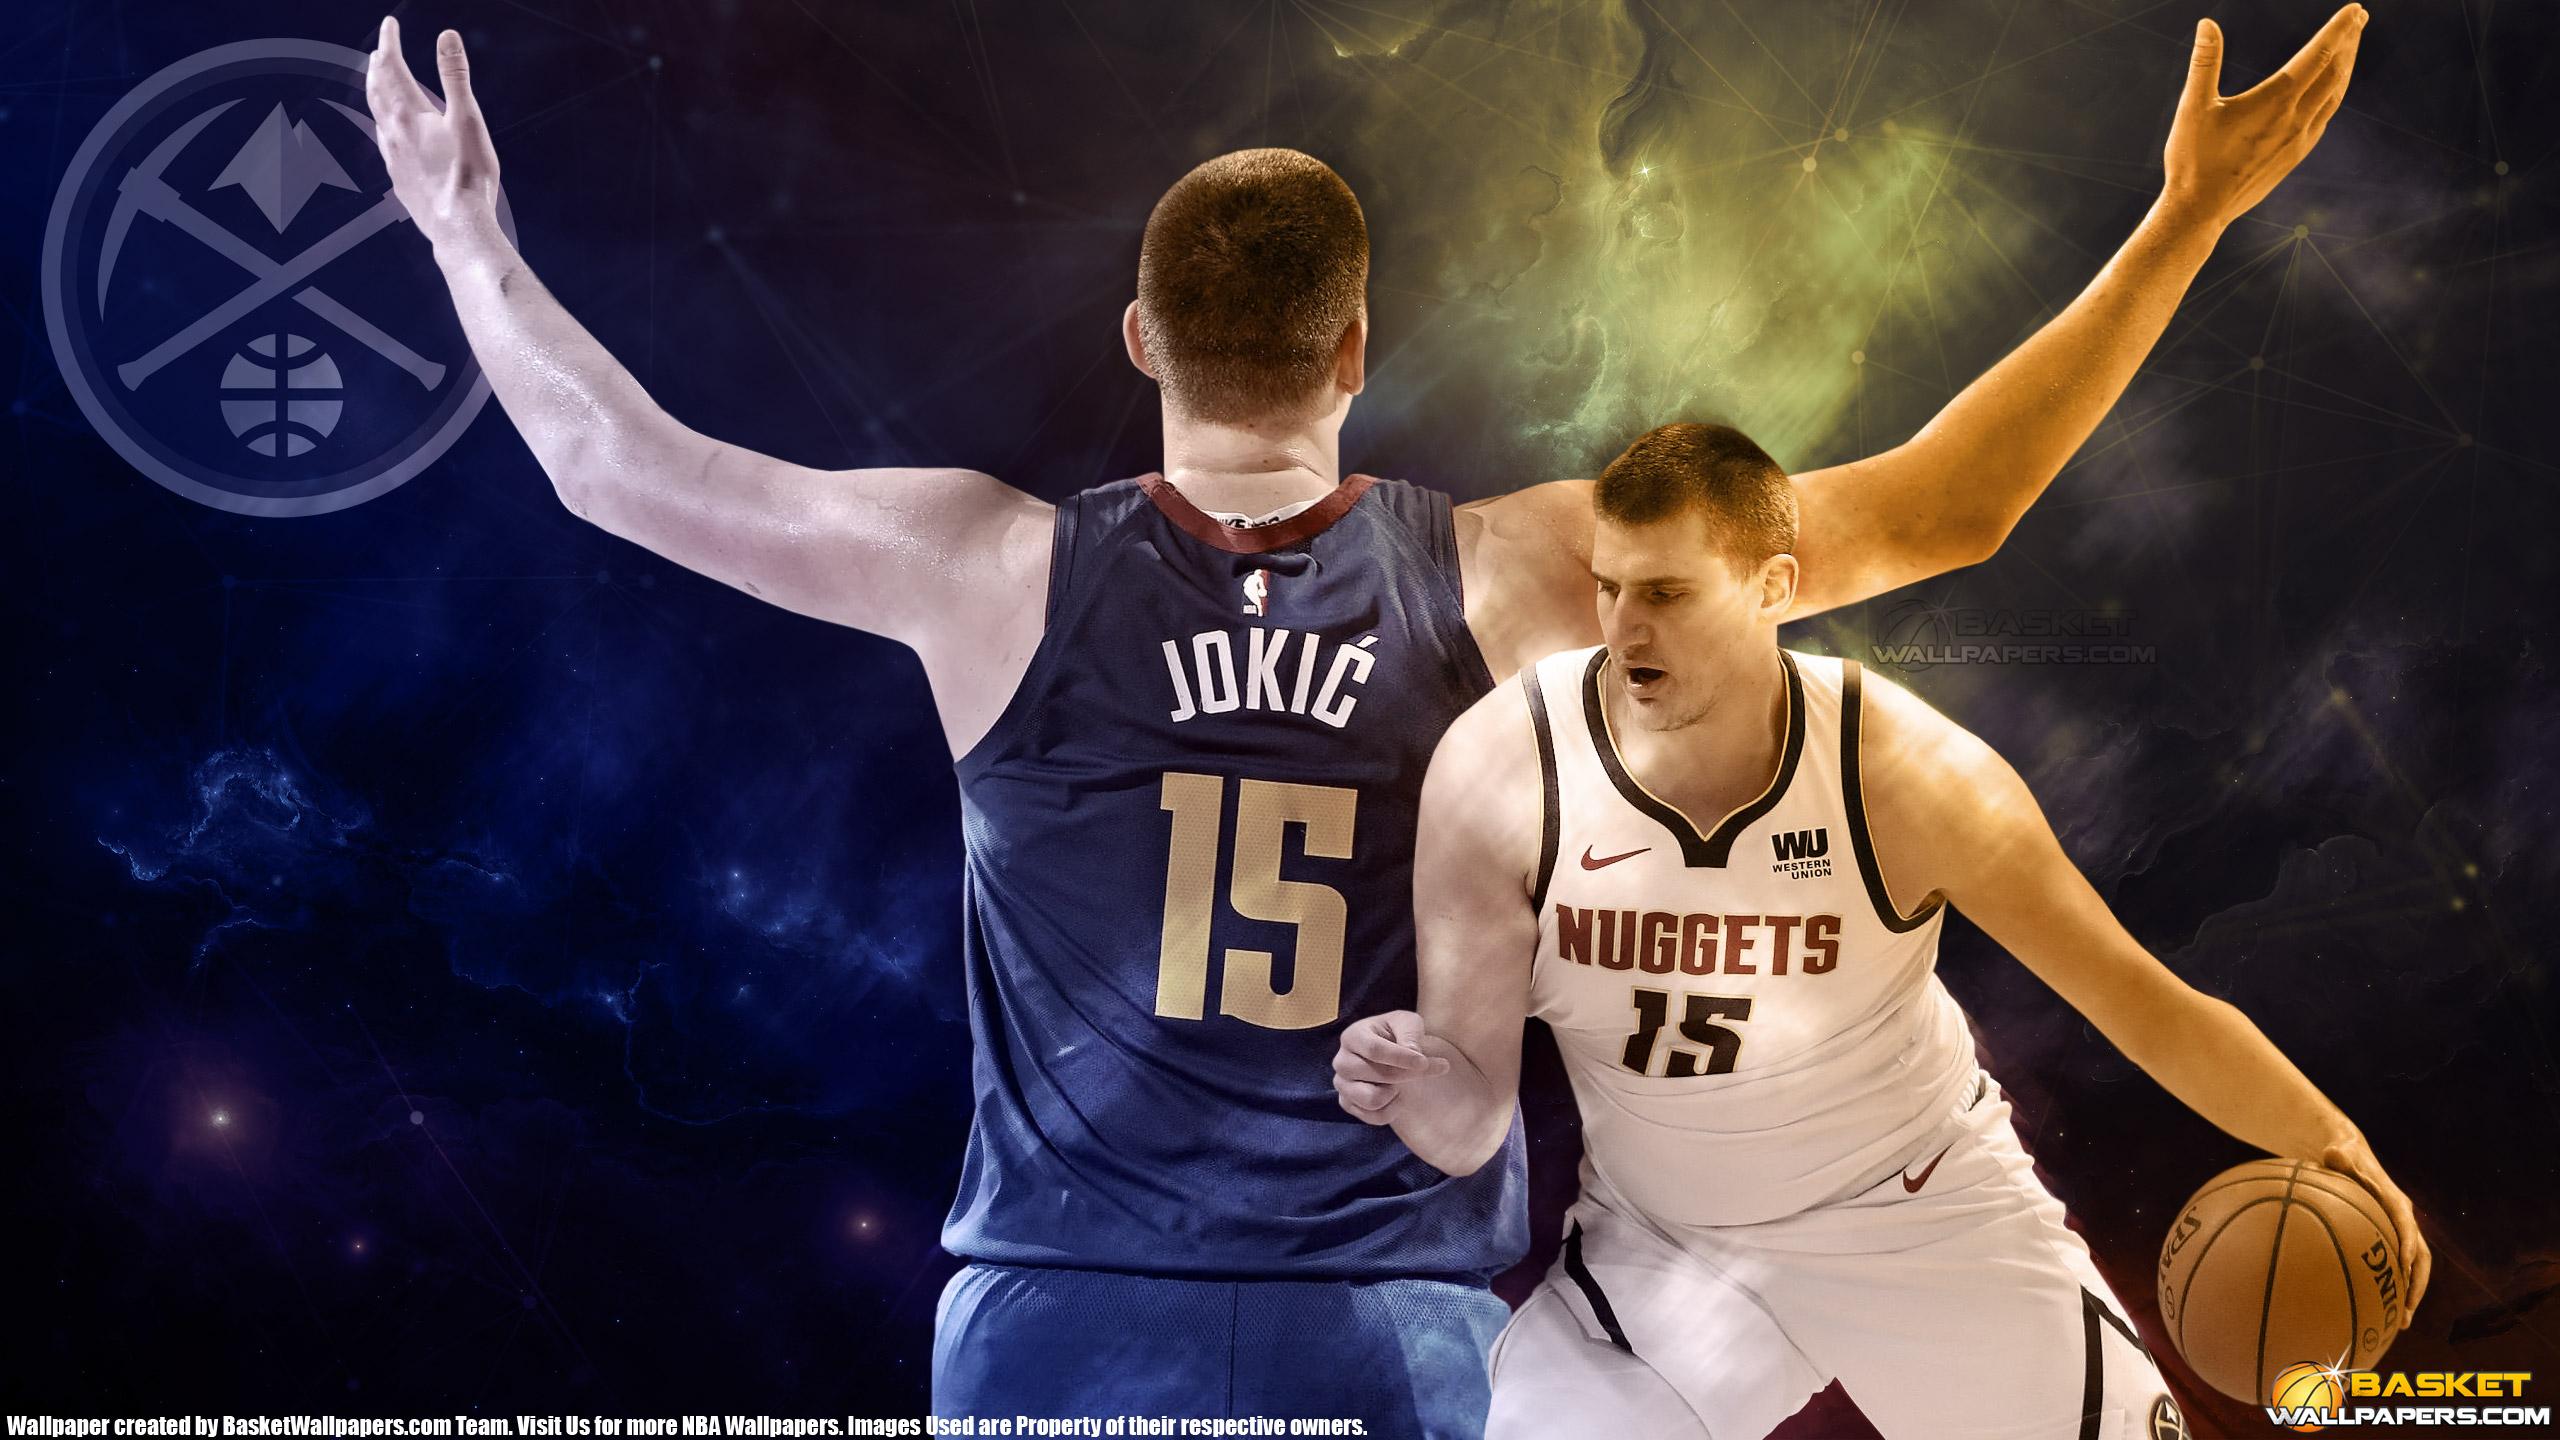 Nikola Jokic Denver Nuggets 2019 2560x1440 Wallpaper